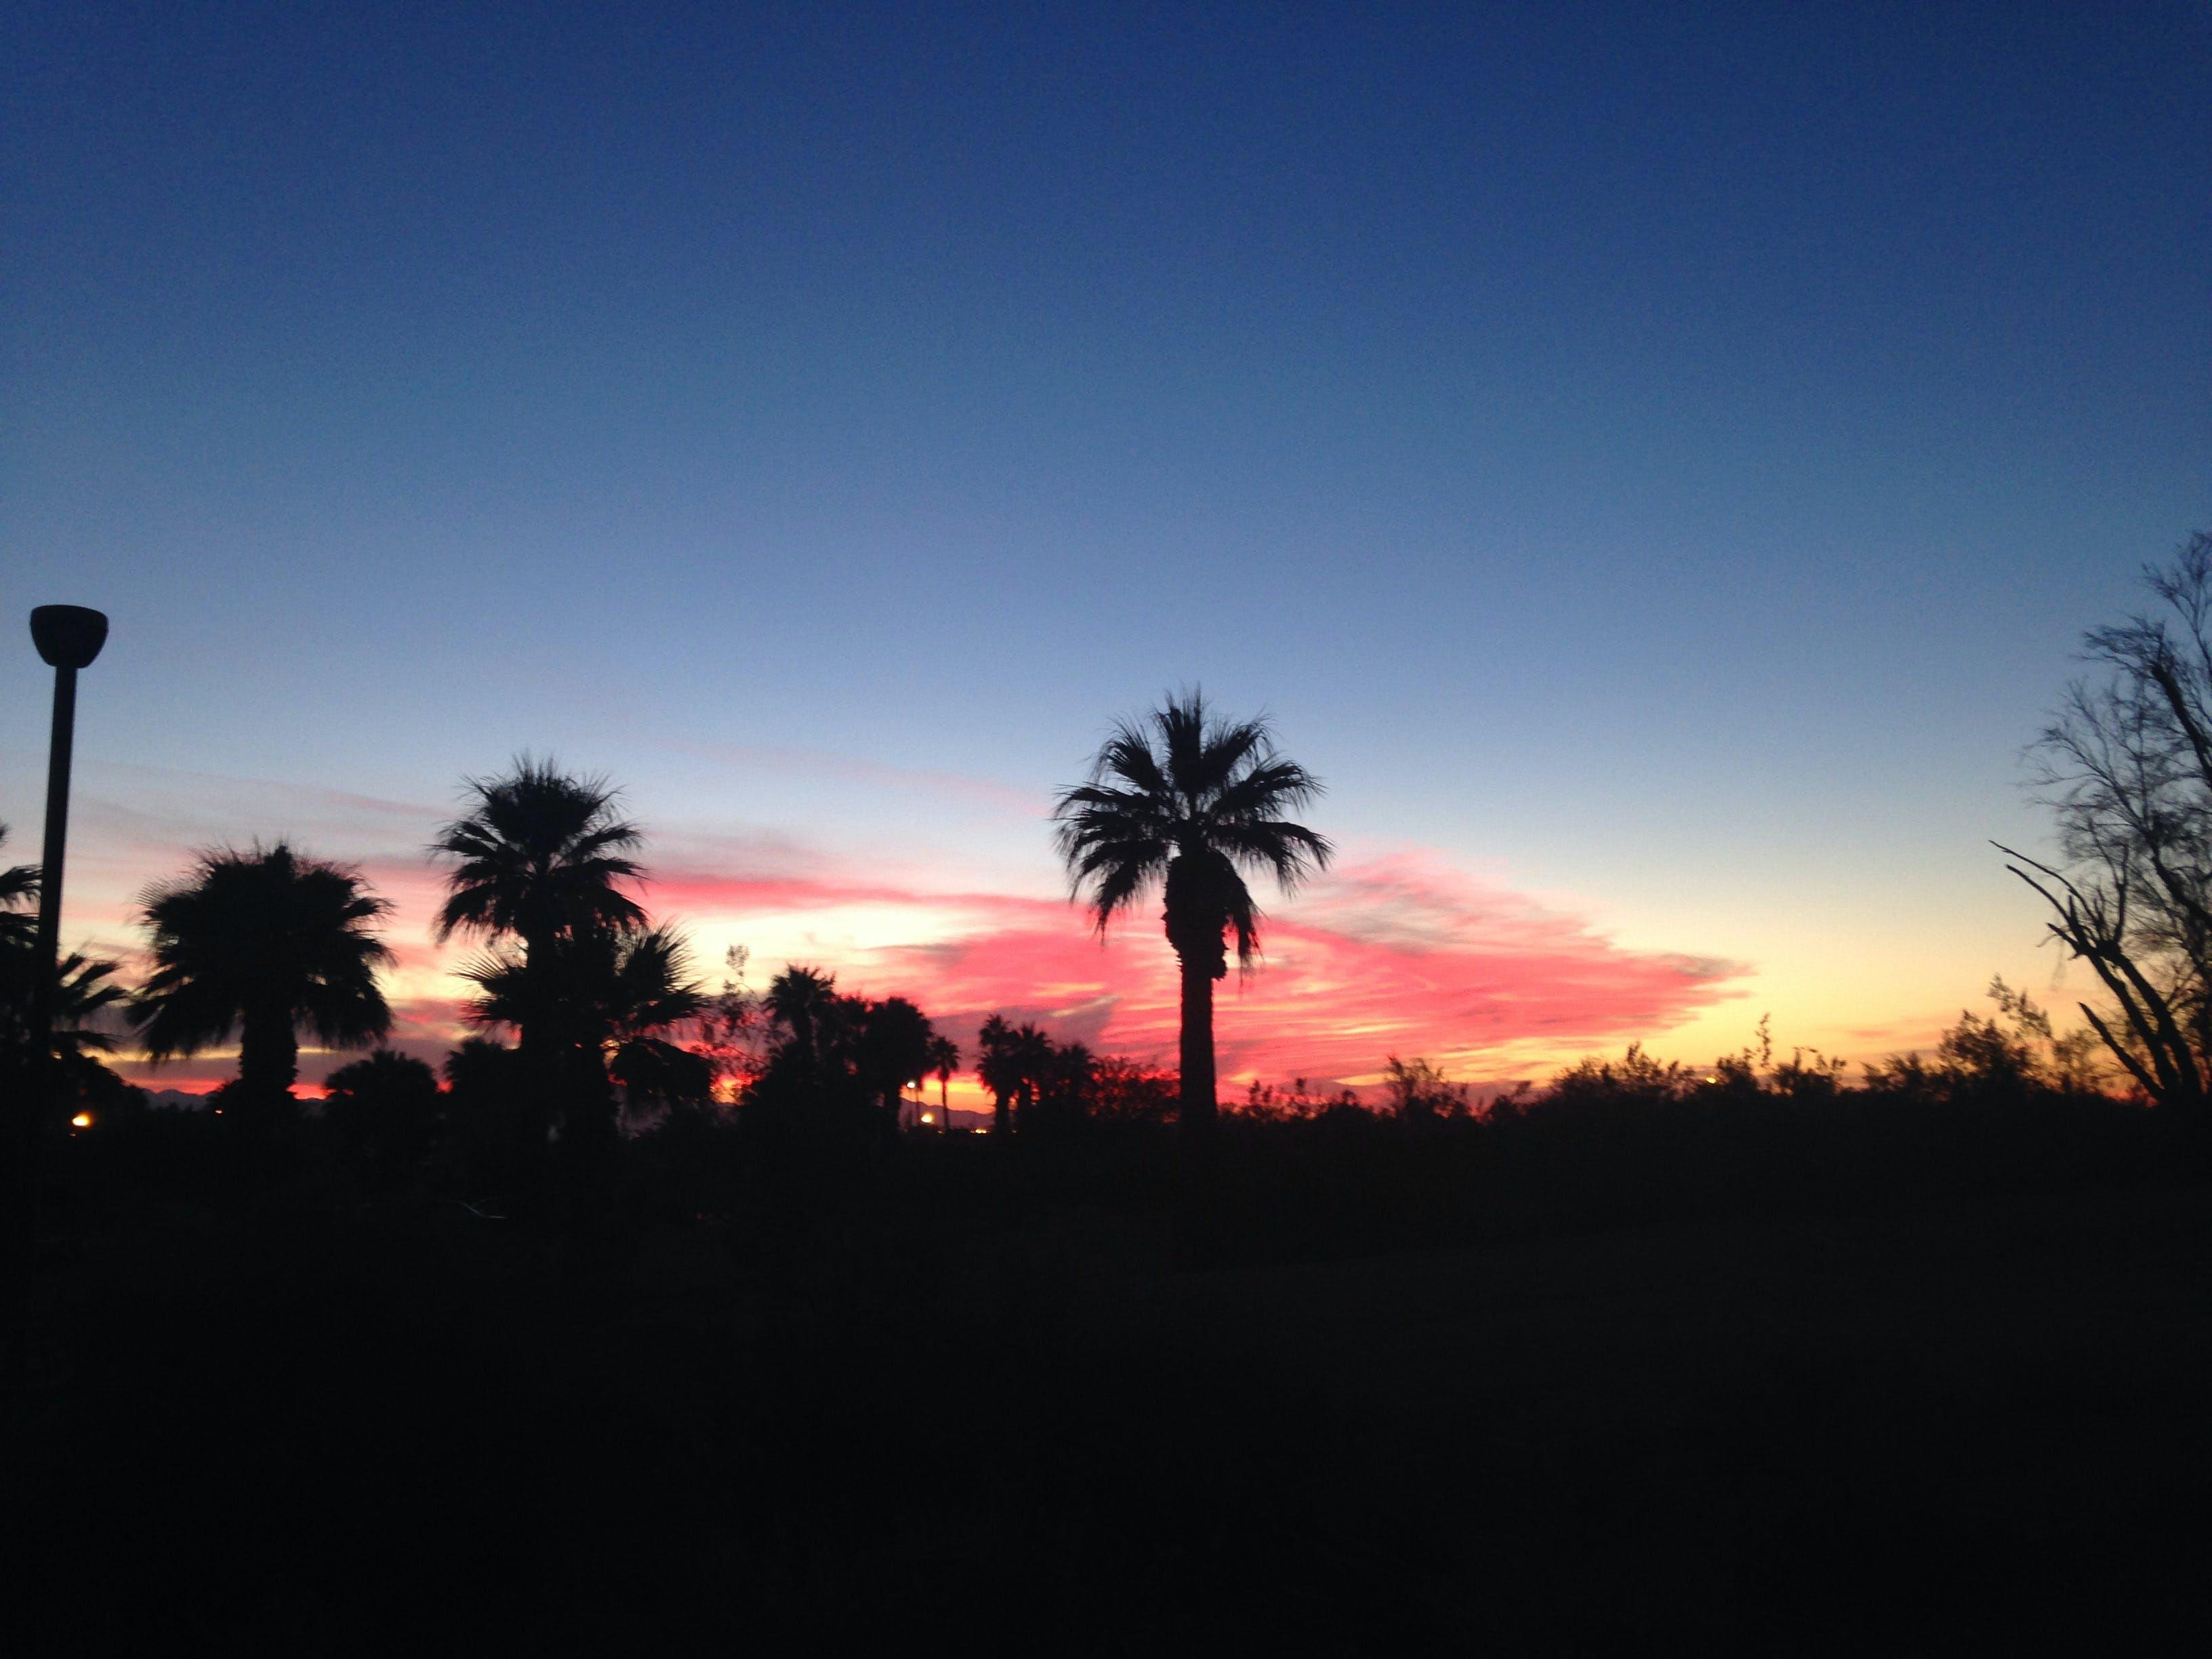 Foto d'estoc gratuïta de capvespre, cel blau, Palmera, silueta urbana